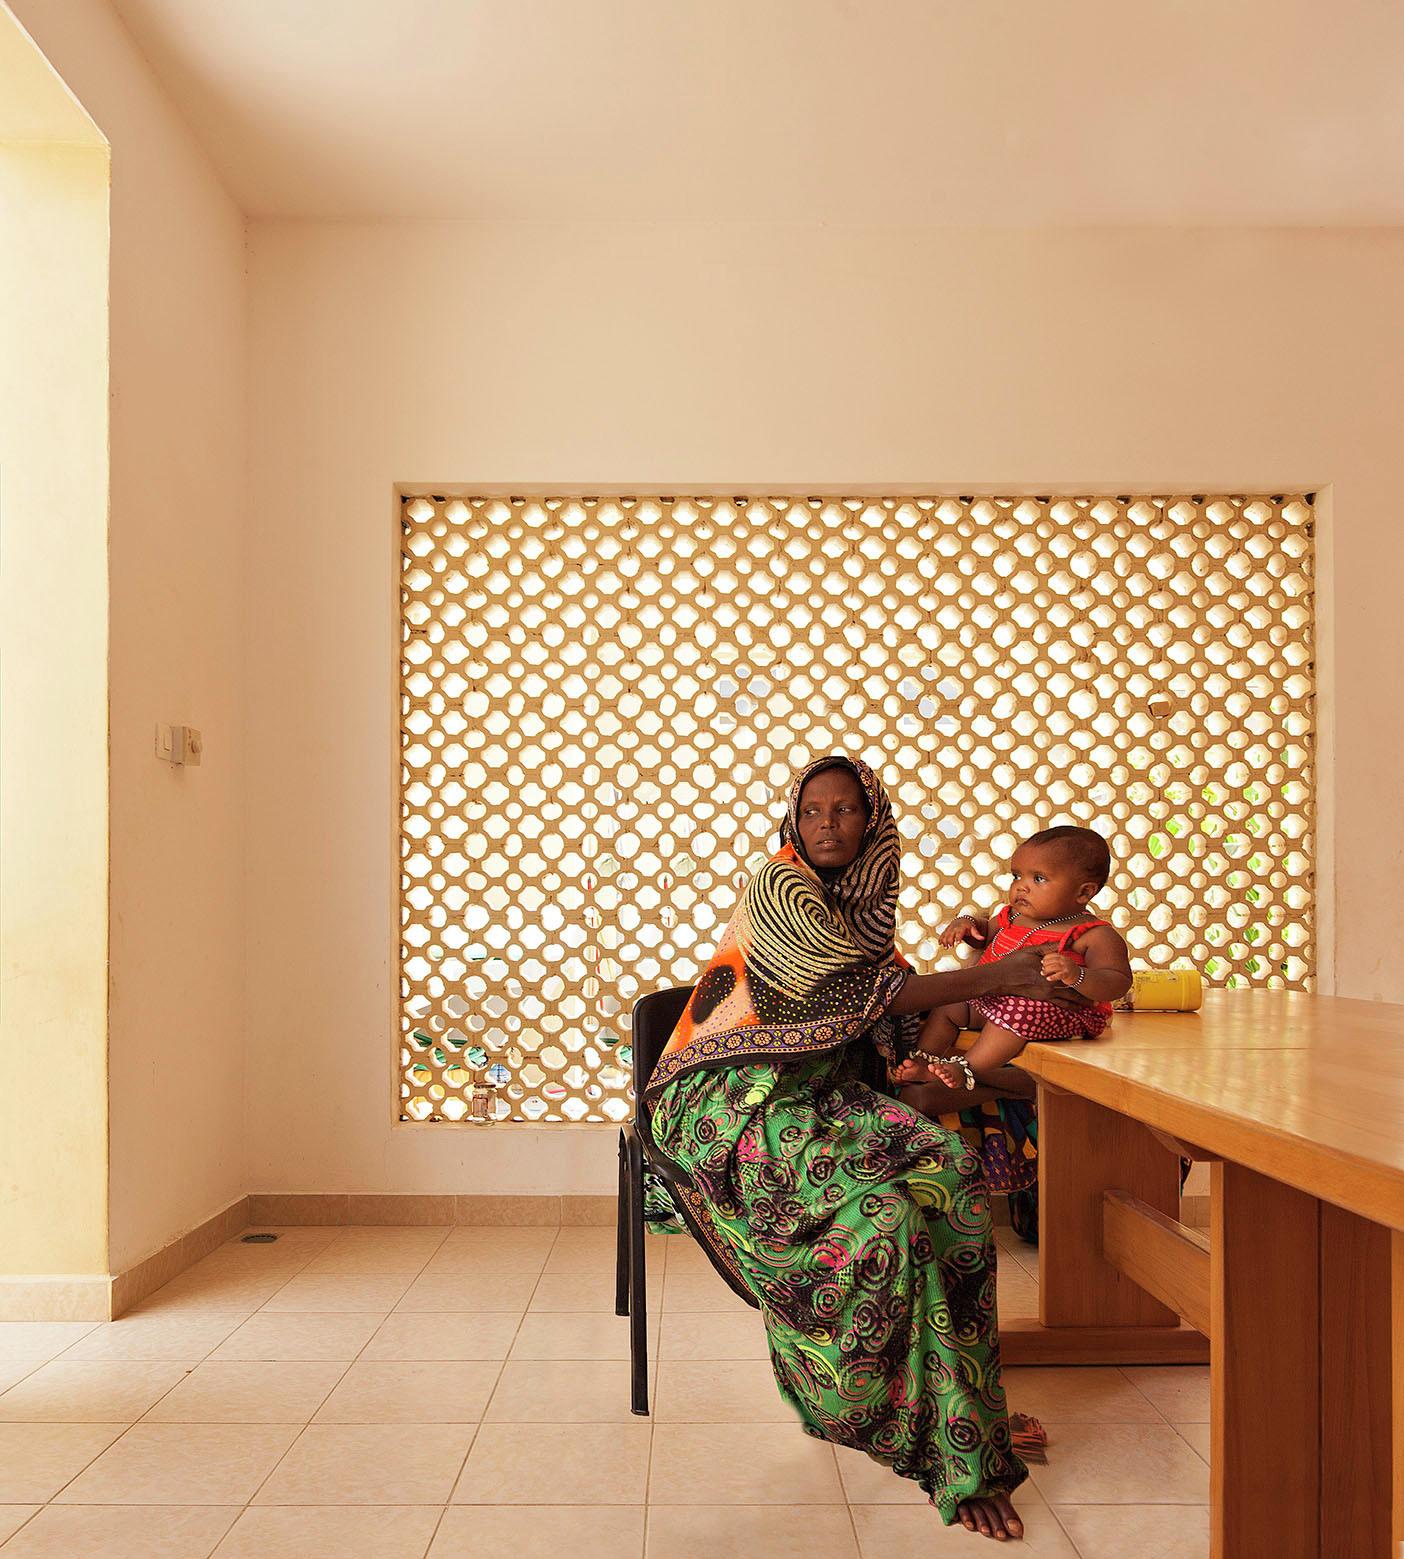 SOS_Village_Djibouti_-_Houses_(13).jpg